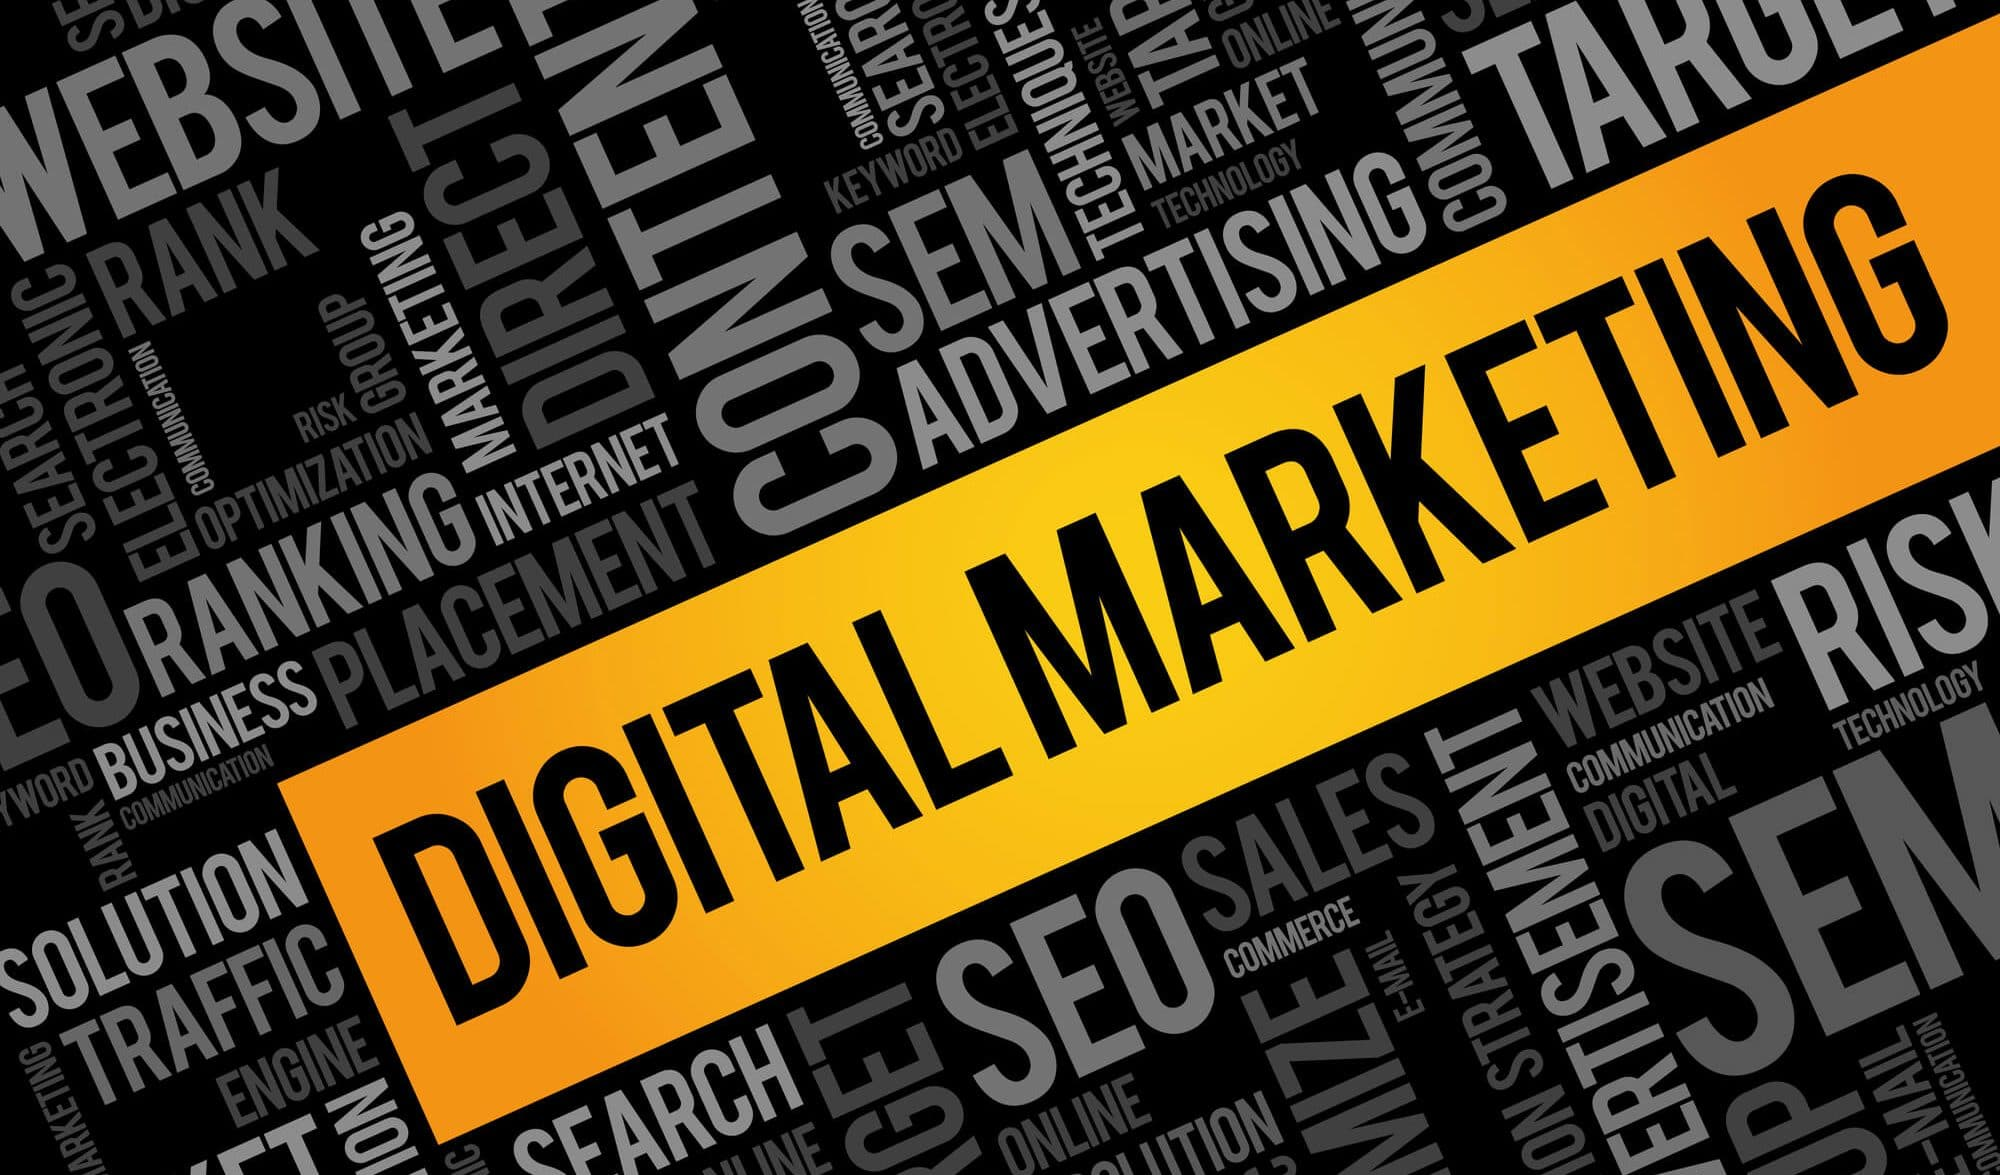 web desing and digital marketing agency louisiana - Infintech Designs